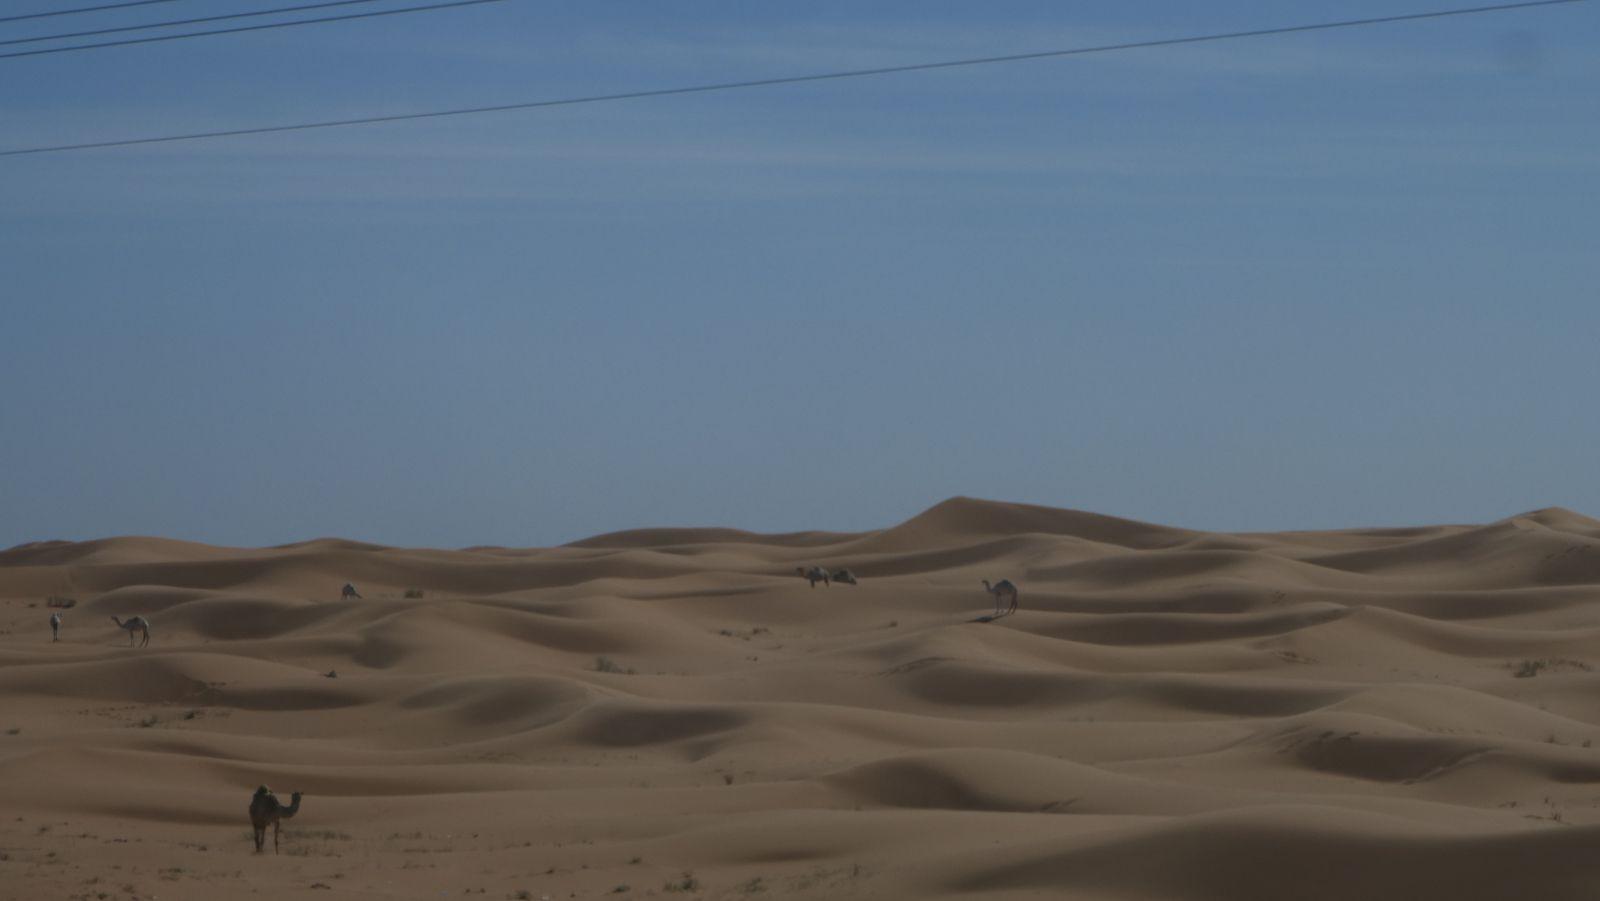 Sable, sable, sable...